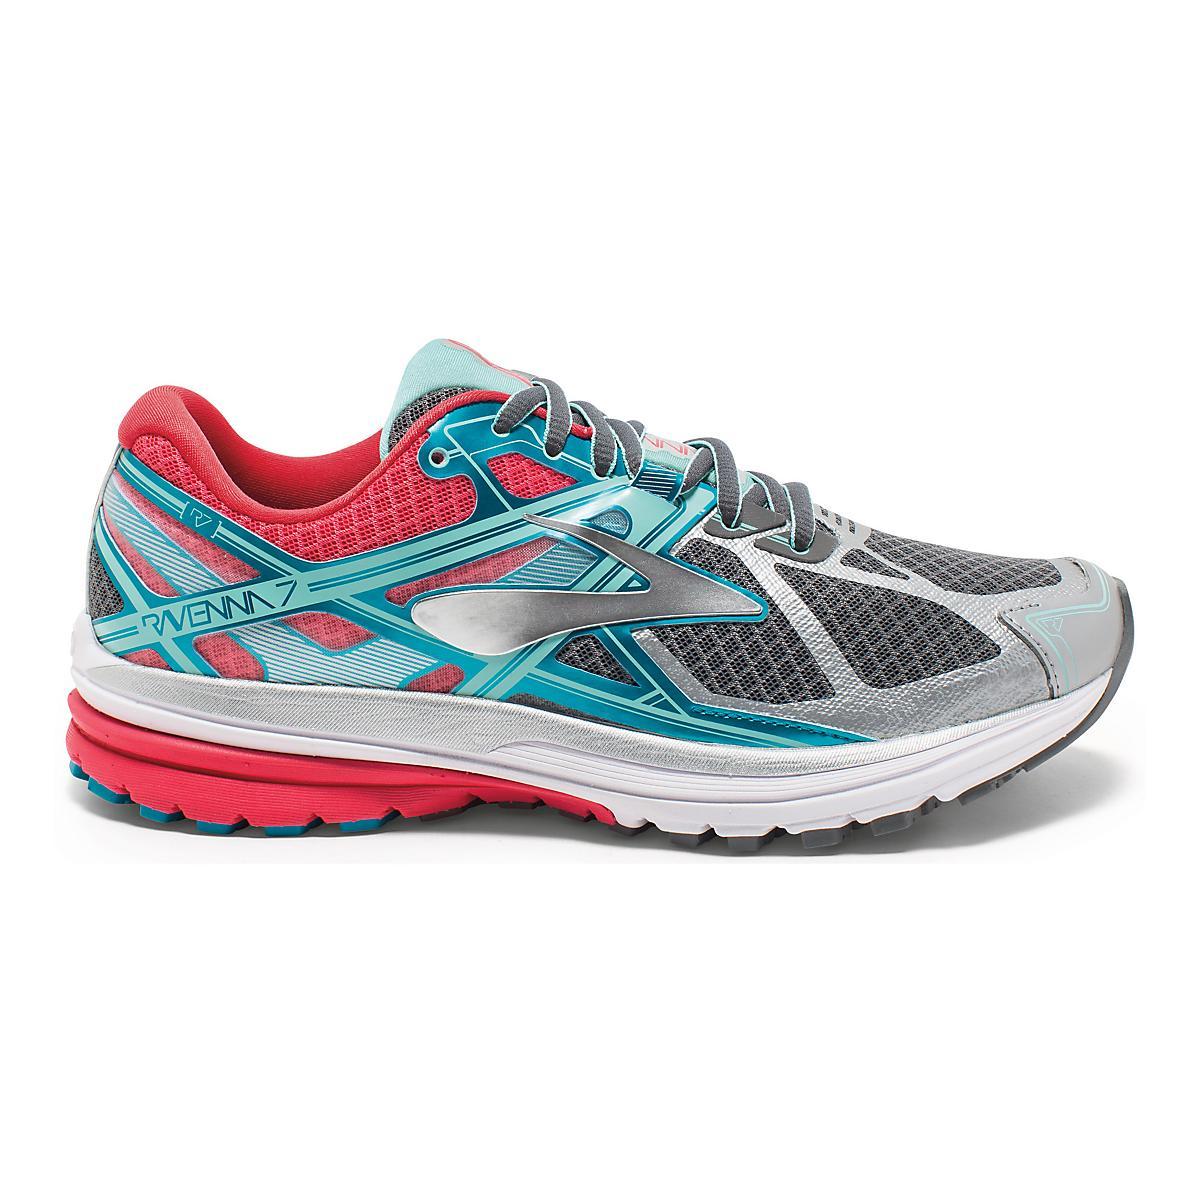 ed4e3dac9eef8 Womens Brooks Ravenna 7 Running Shoe at Road Runner Sports